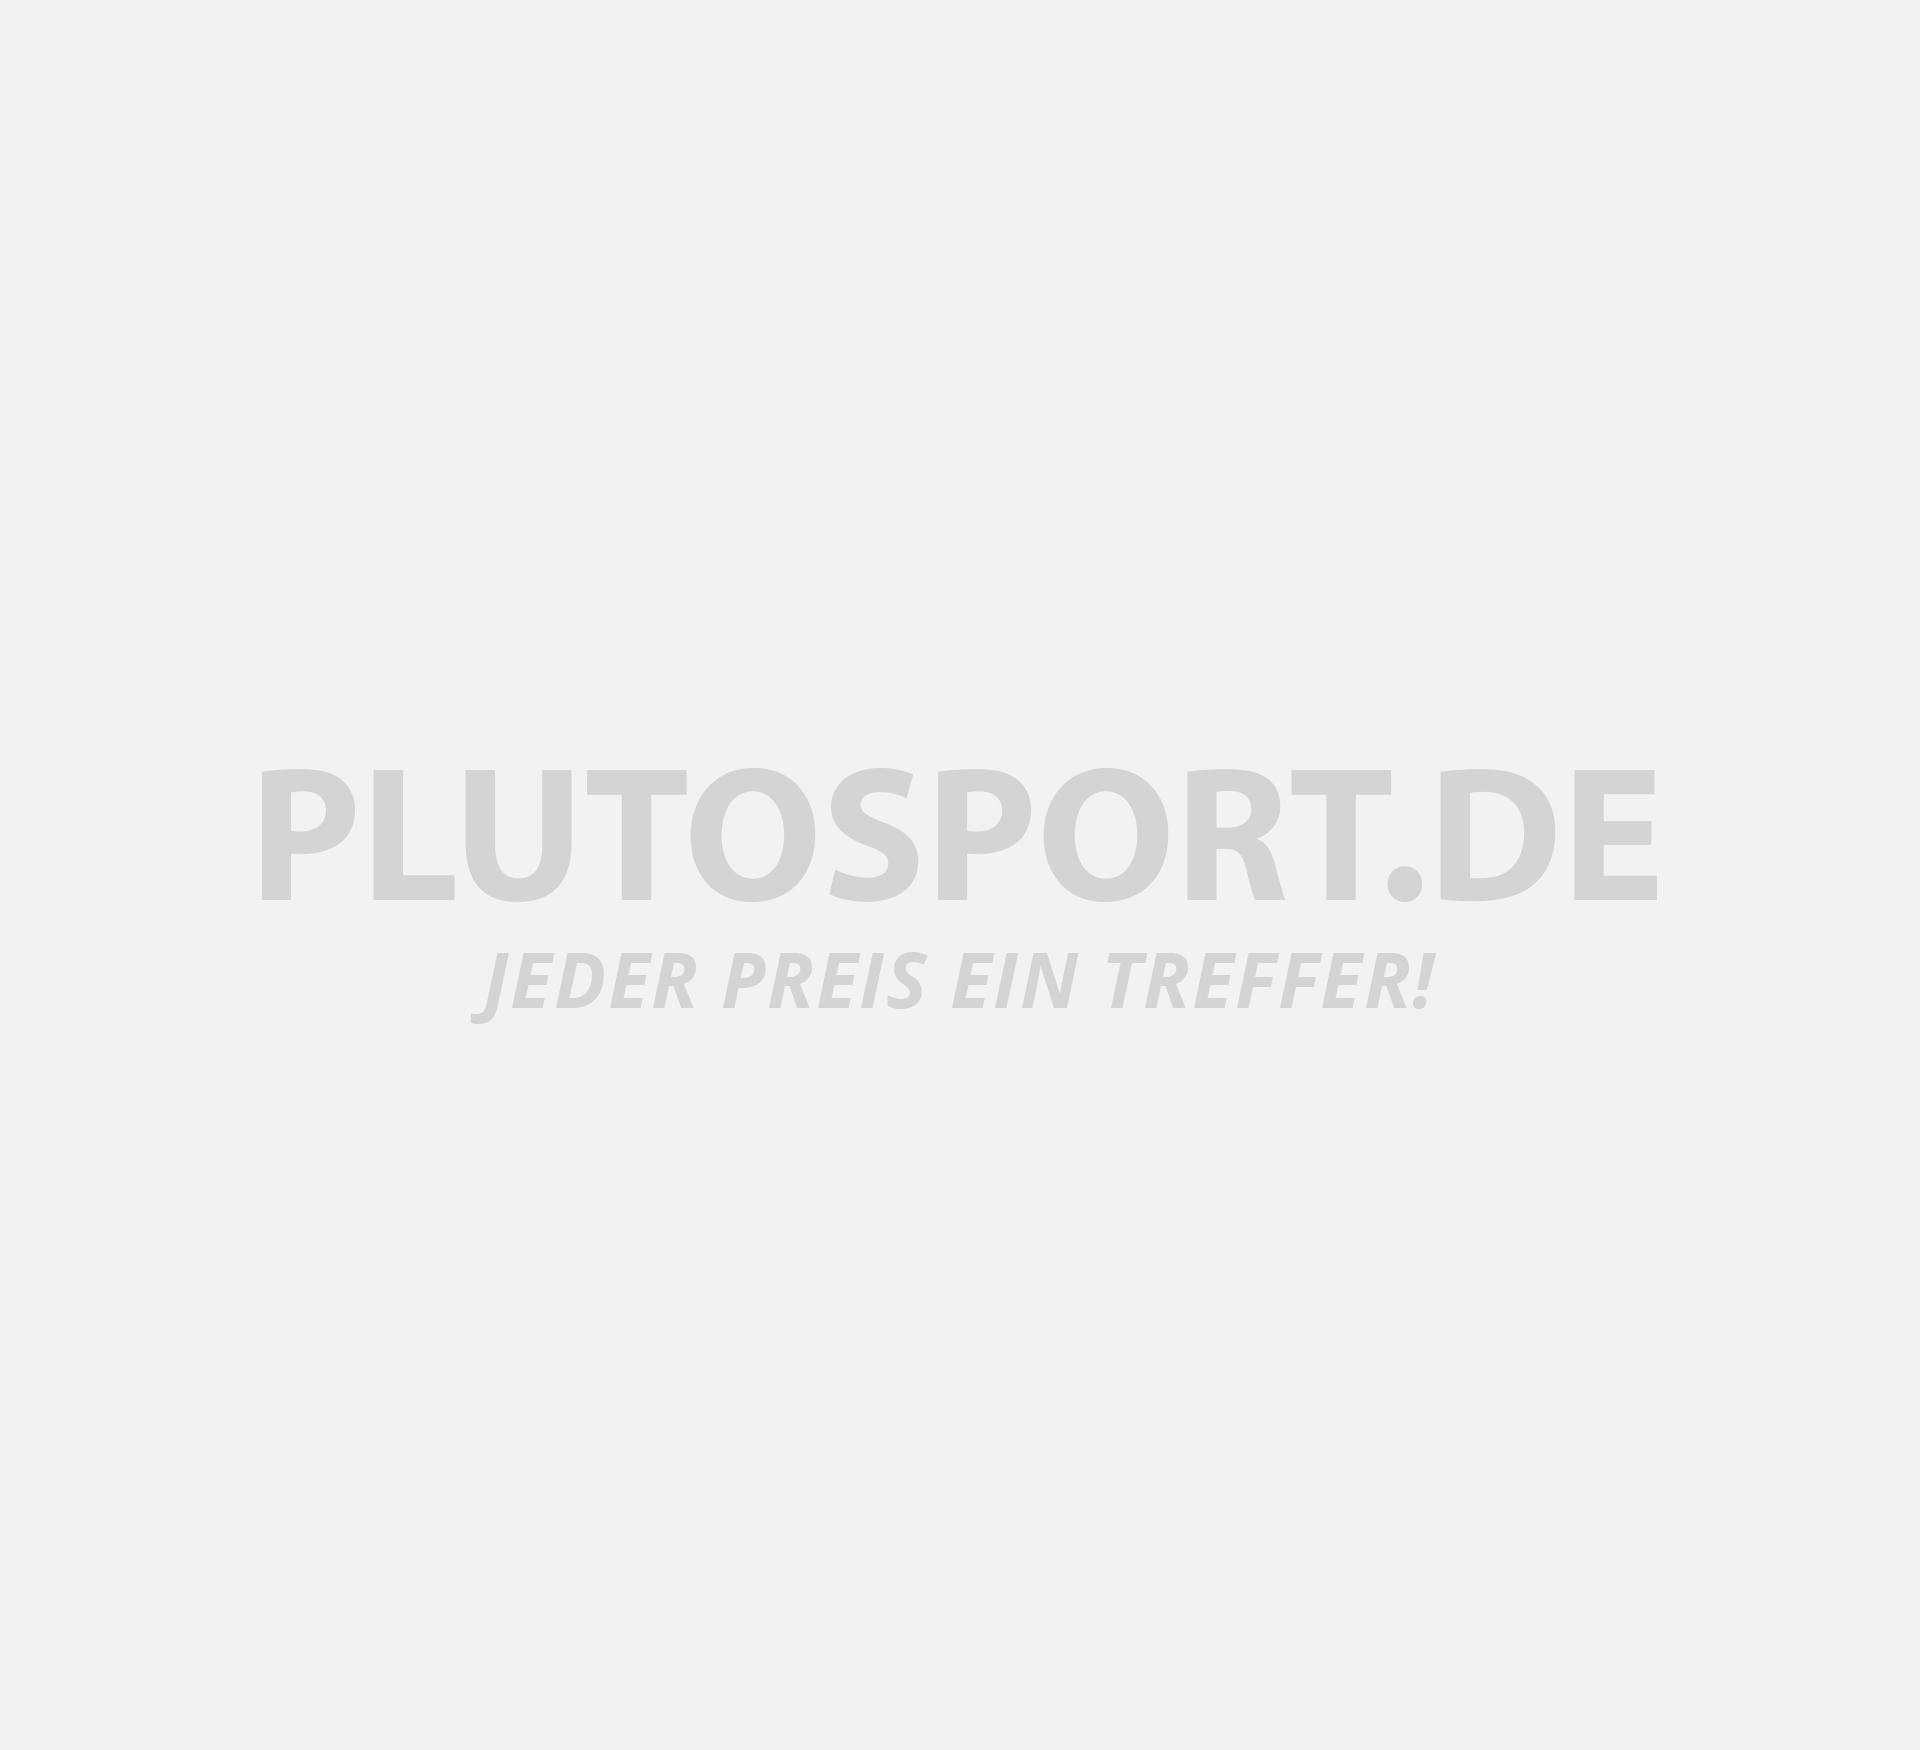 Reusch Serathor Pro M1 Ortho-Tec Junior